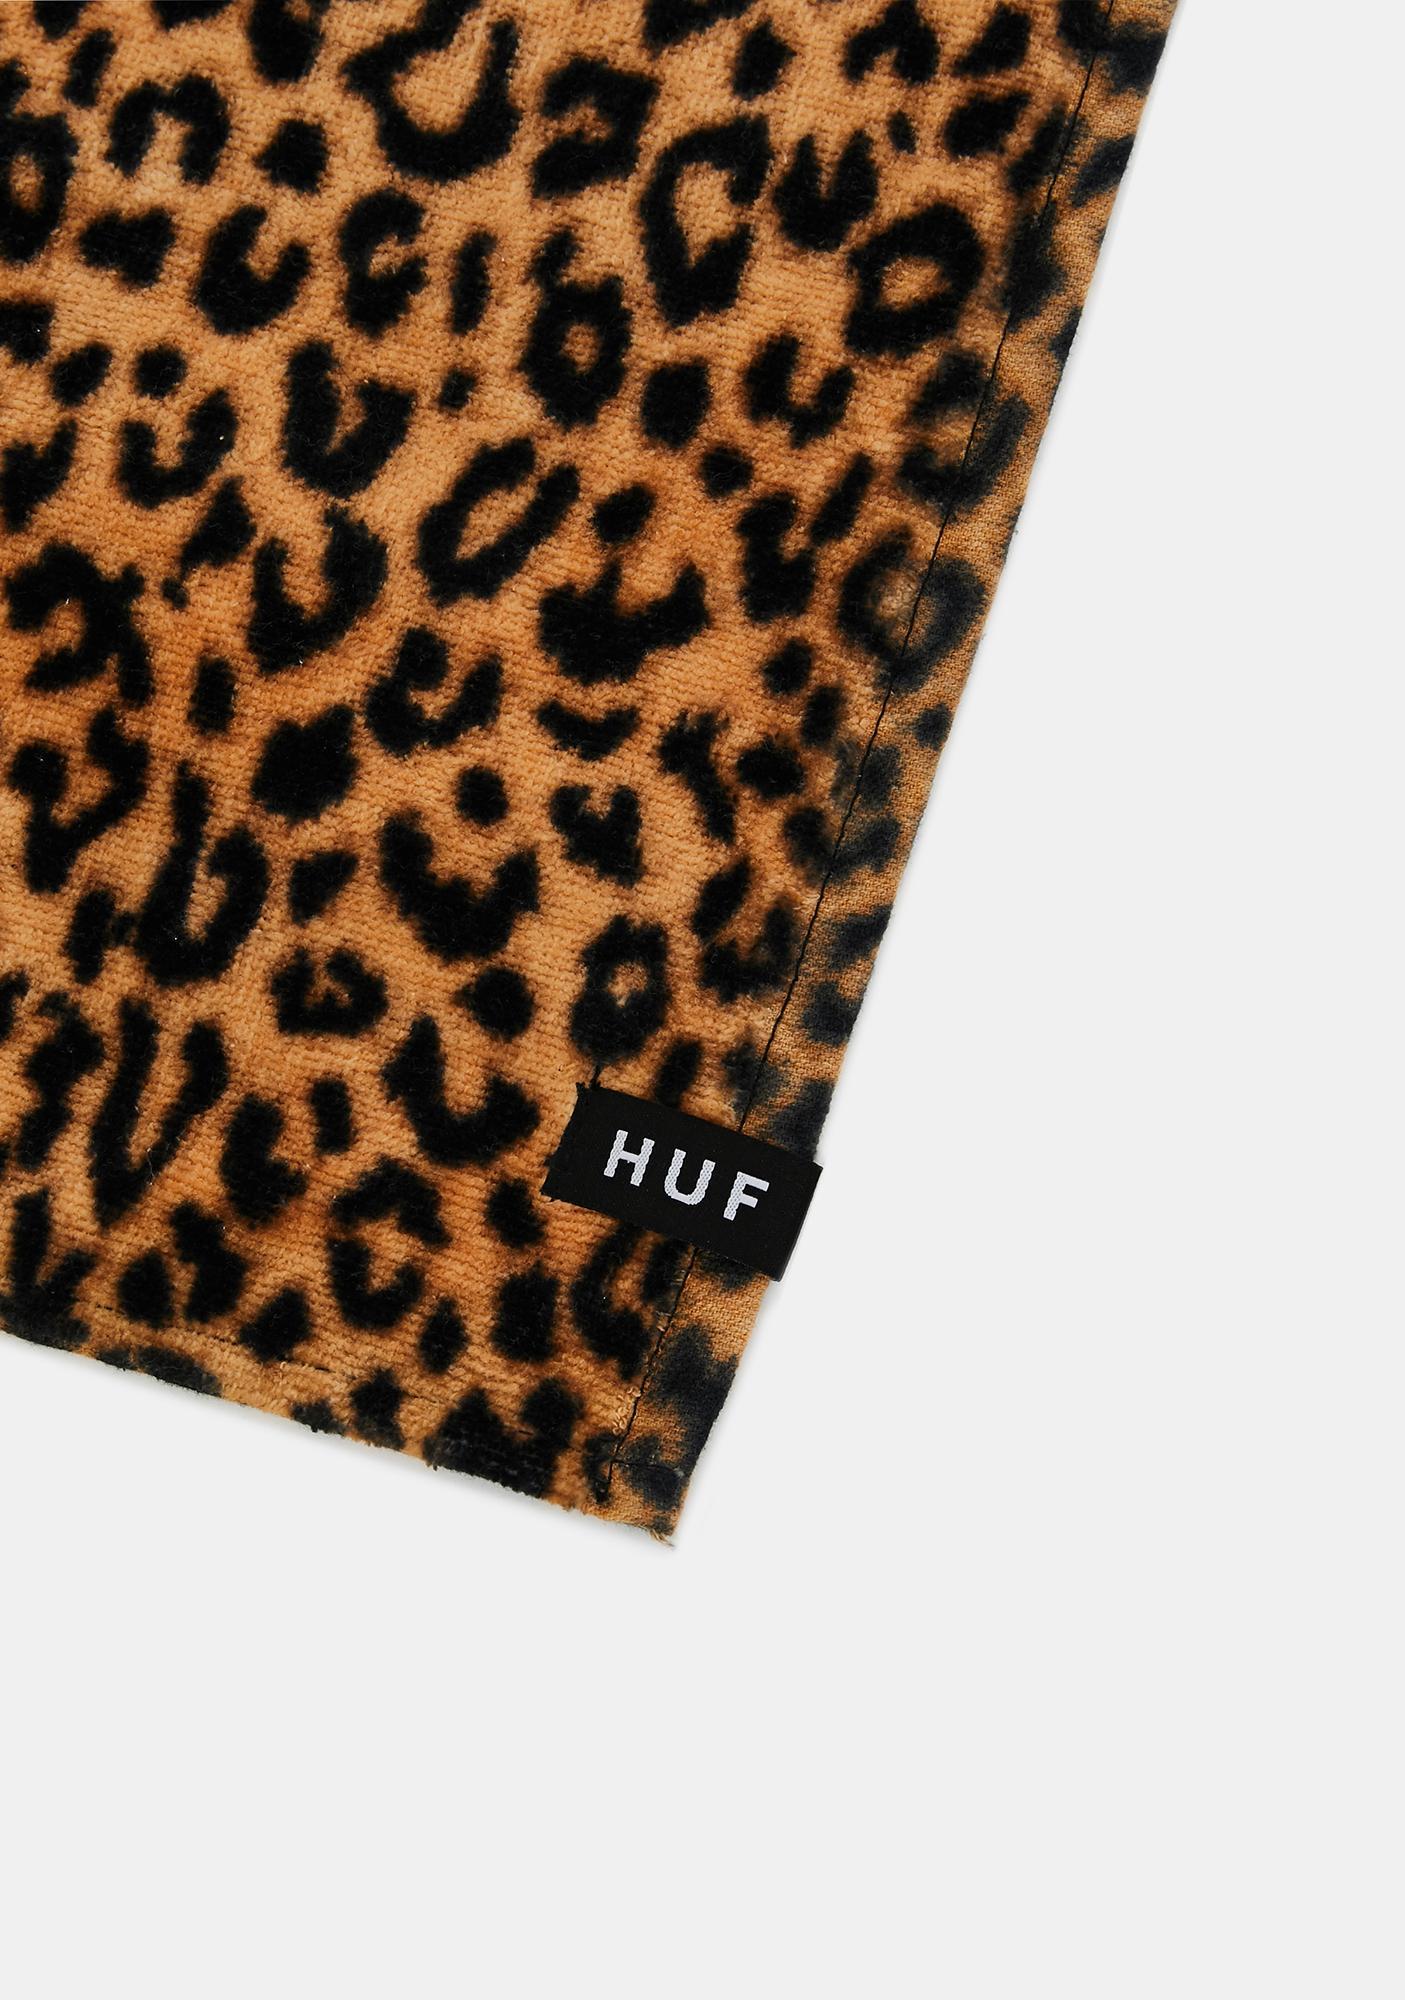 HUF Leopard Print Beach Towel